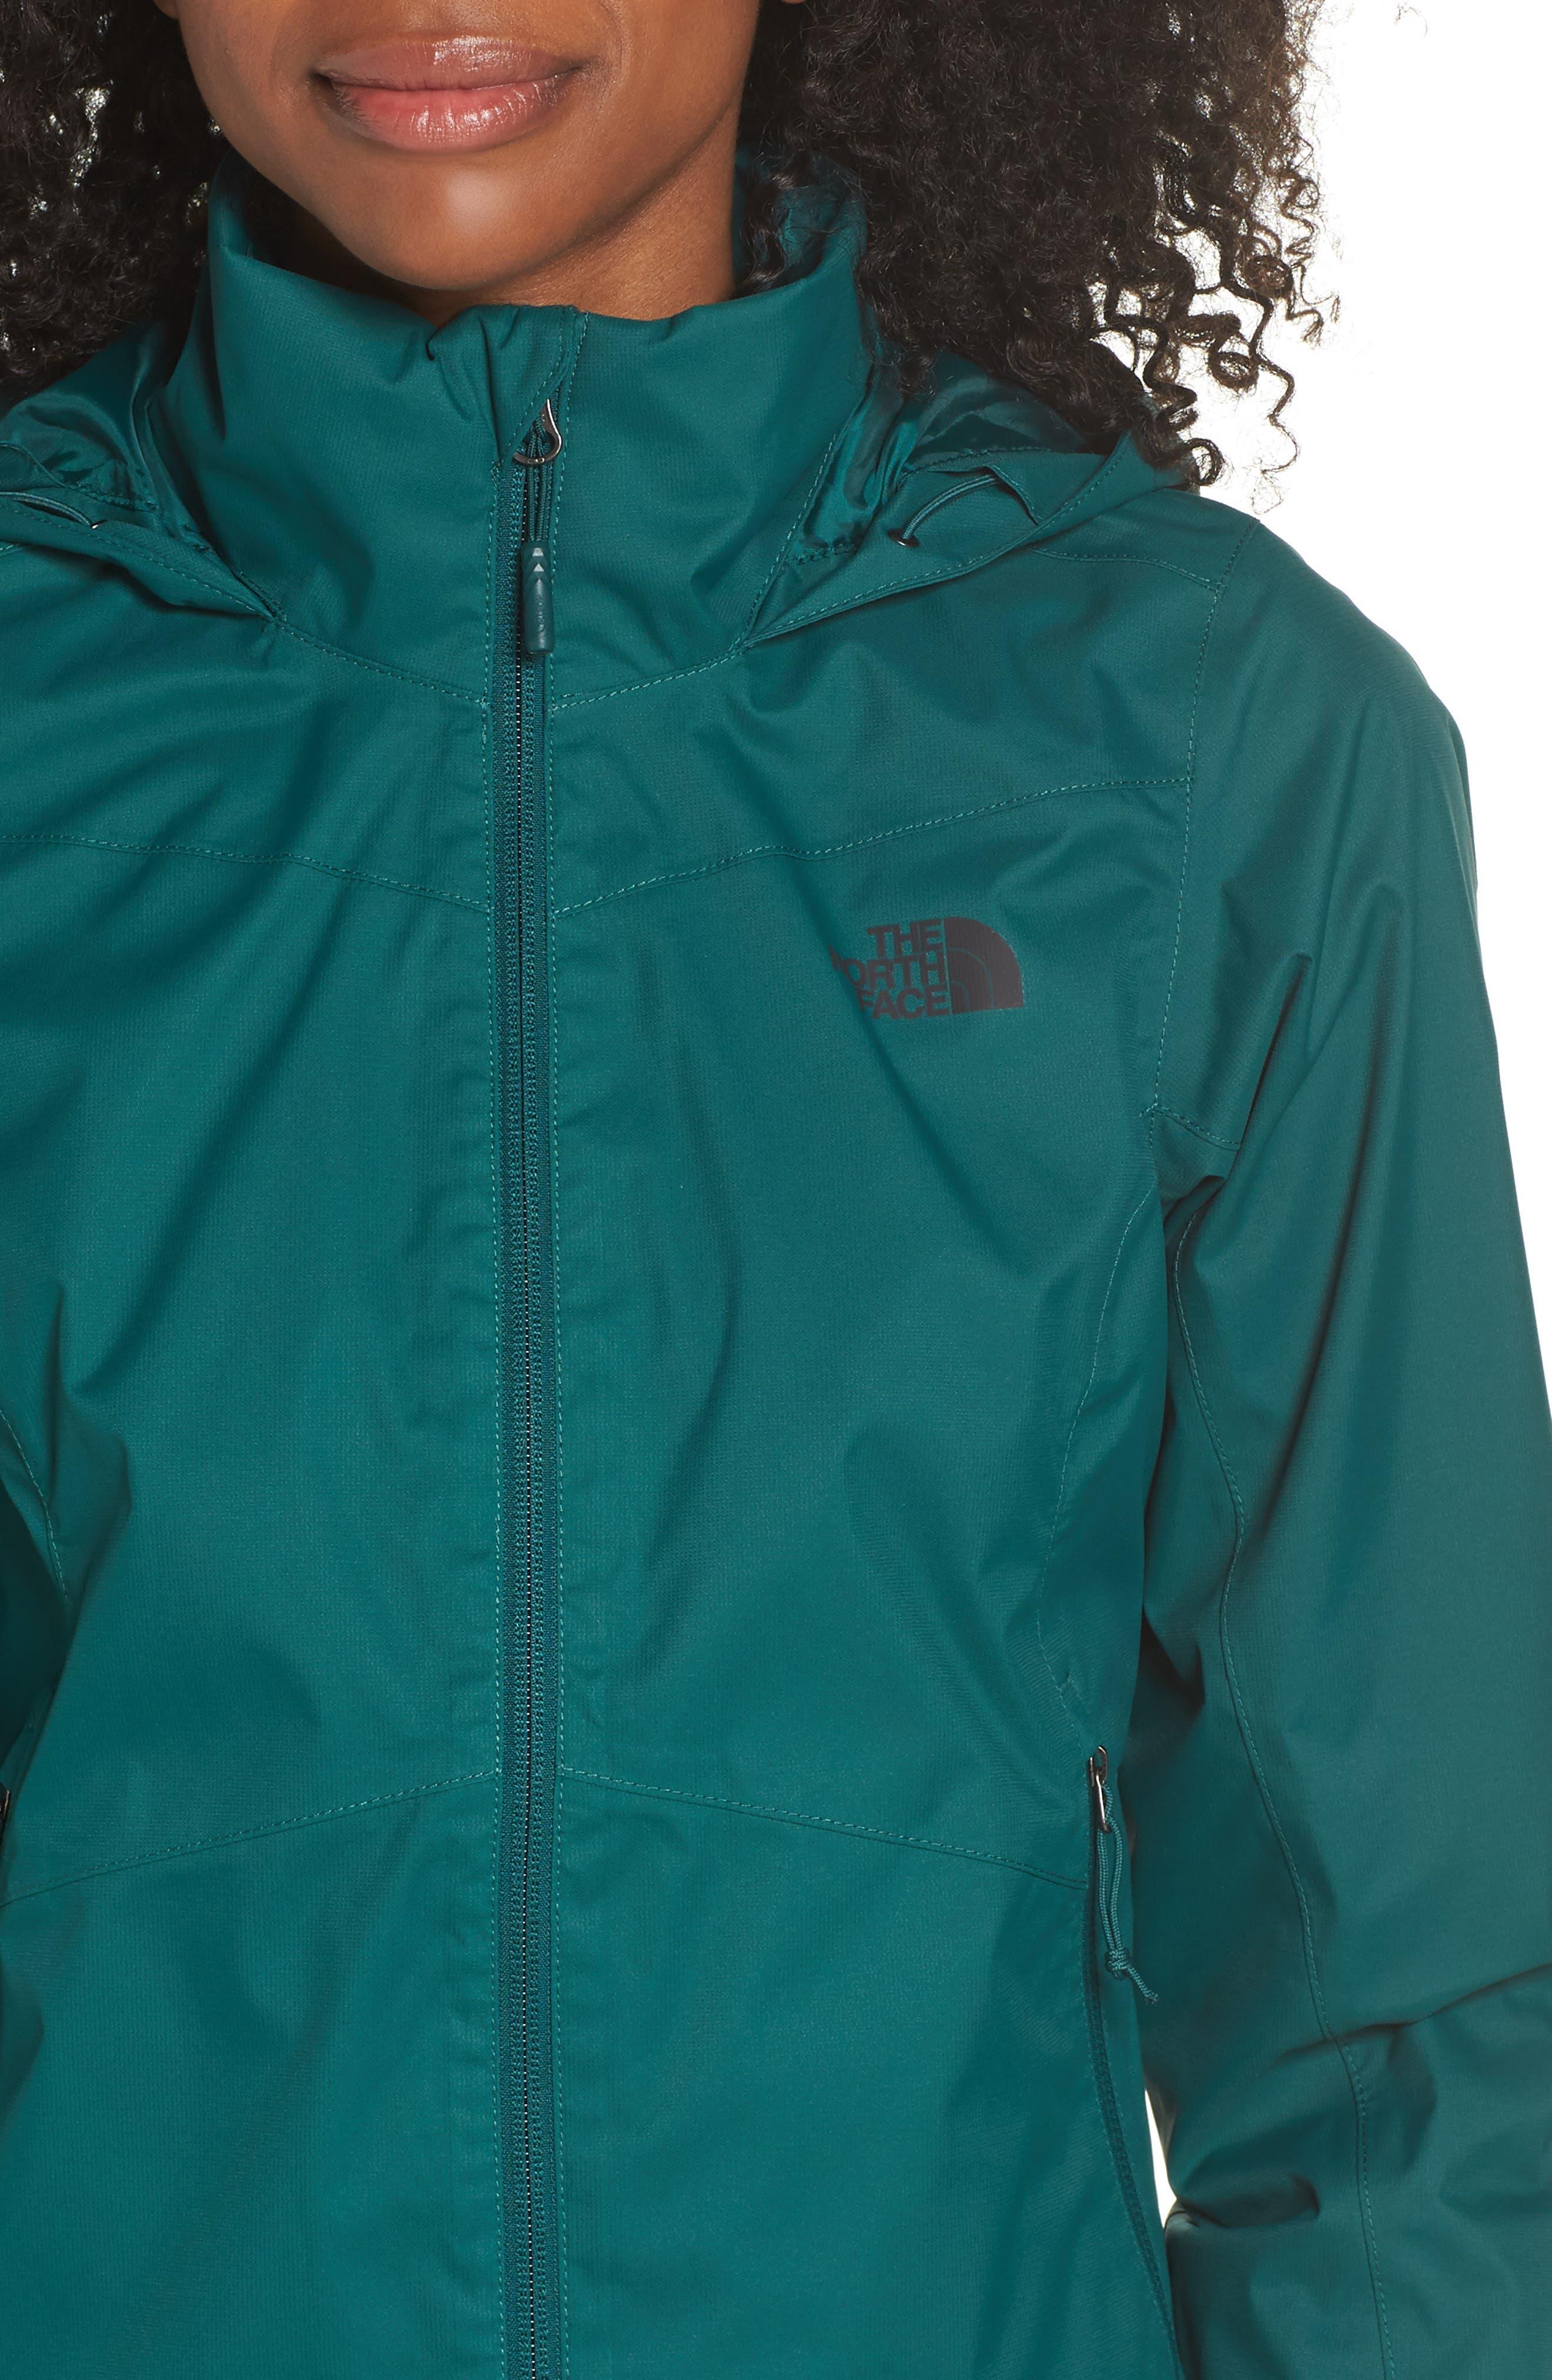 Resolve Plus Waterproof Jacket,                             Alternate thumbnail 4, color,                             BOTANICAL GREEN